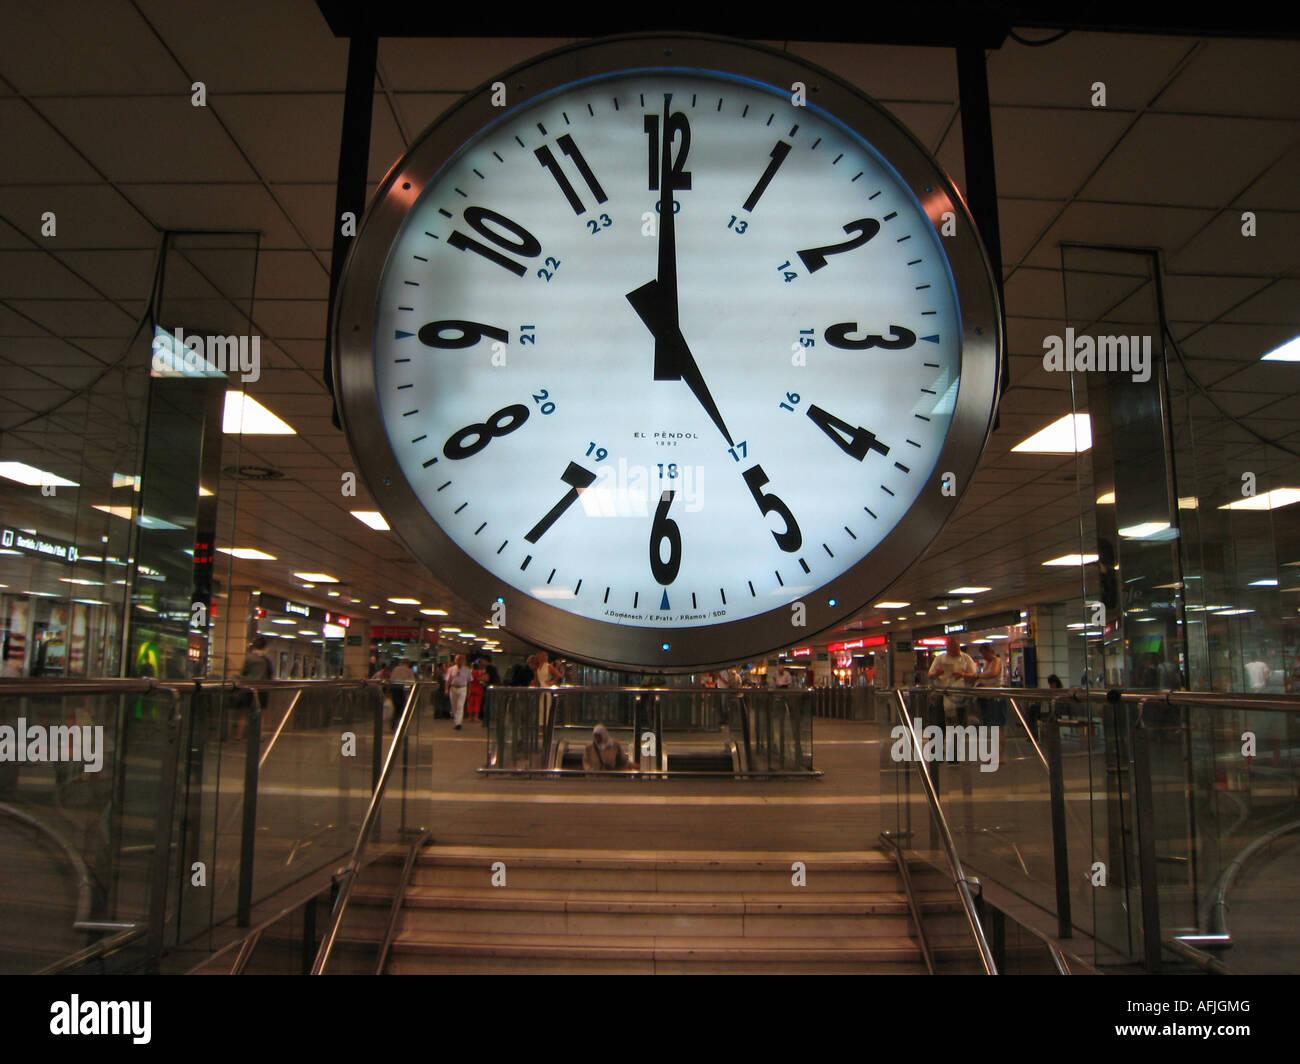 large railway clock at underground station Place de Catalunya Barcelona Spain Stock Photo